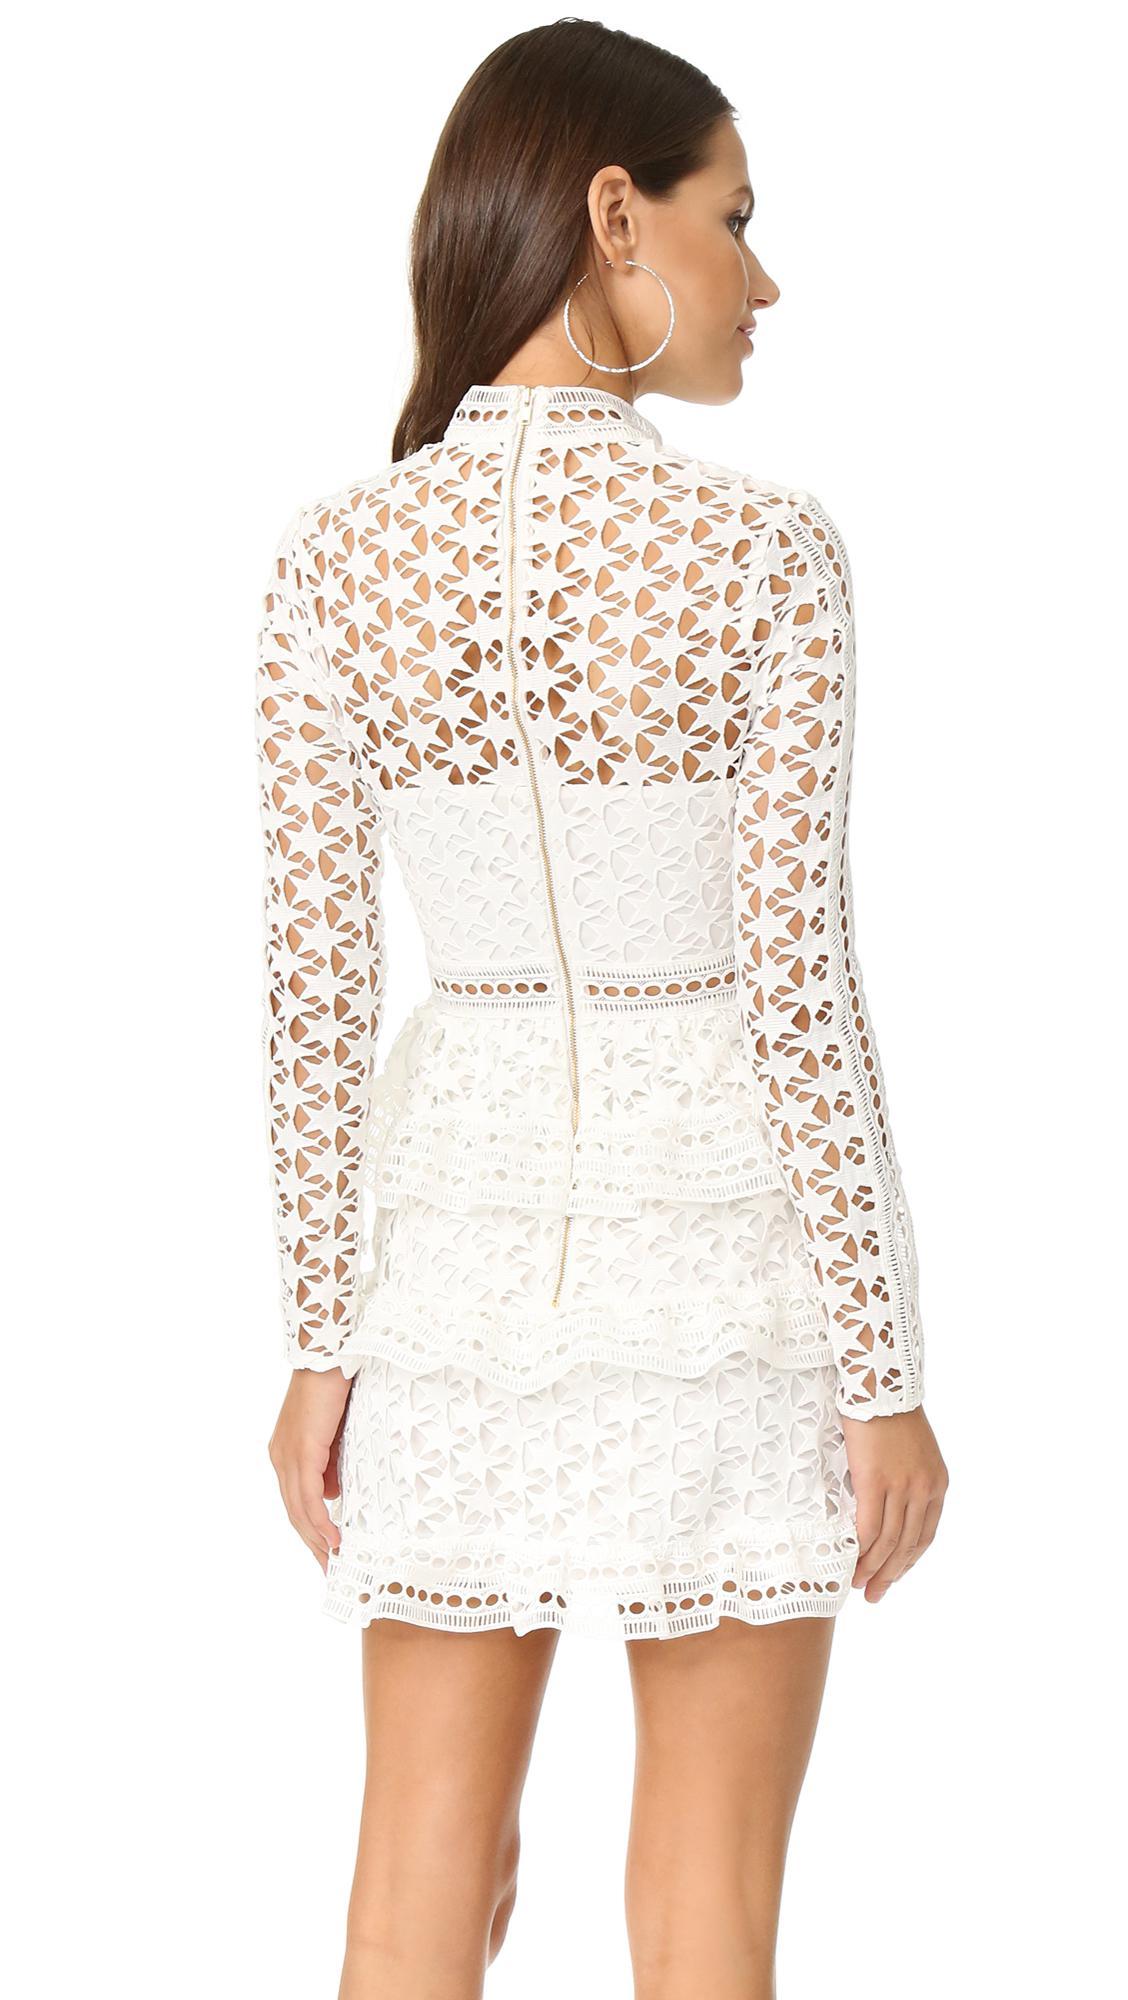 f59663c781c Self-Portrait High Neck Star Lace Dress in White - Lyst